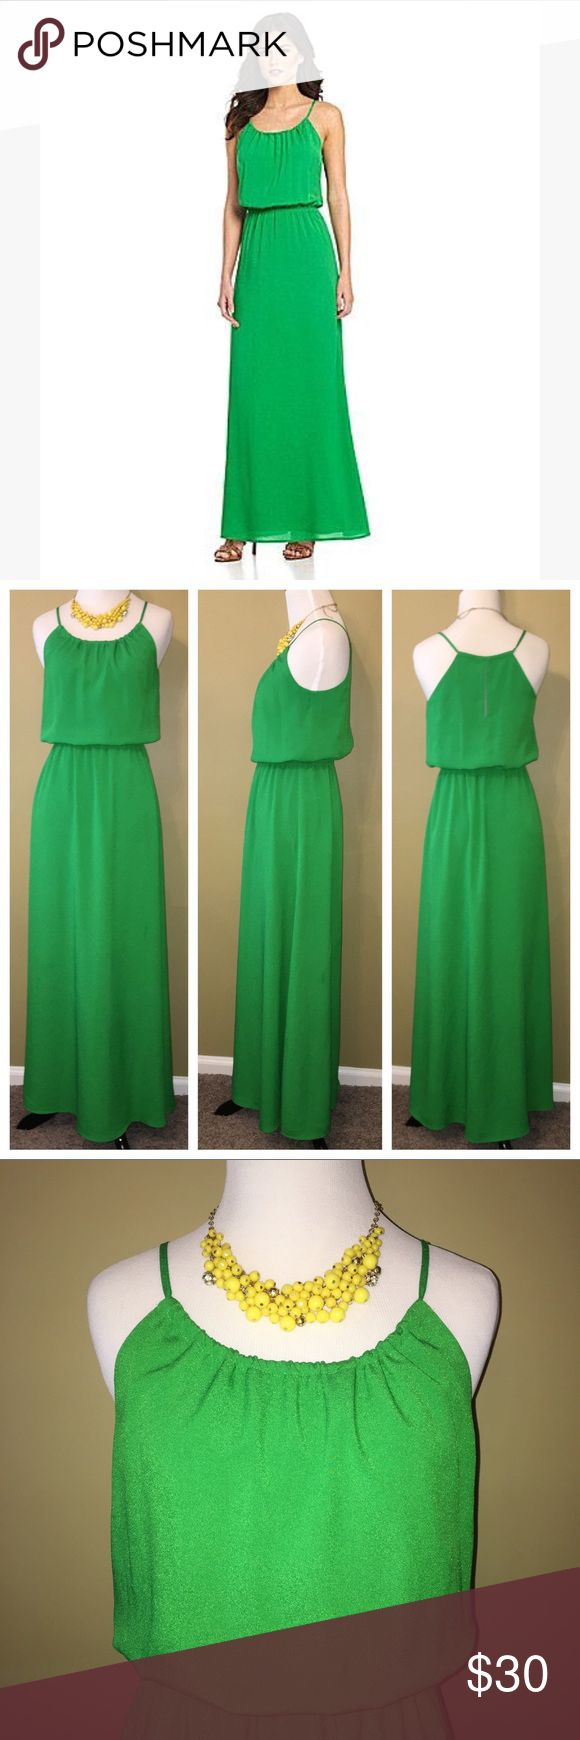 Gianni Bini Green maxi dress XS Beautiful kelly green maxi dress by Gianni Bini. Features cinch-able neckline and small key hole back. Size XS. Gianni Bini Dresses Maxi